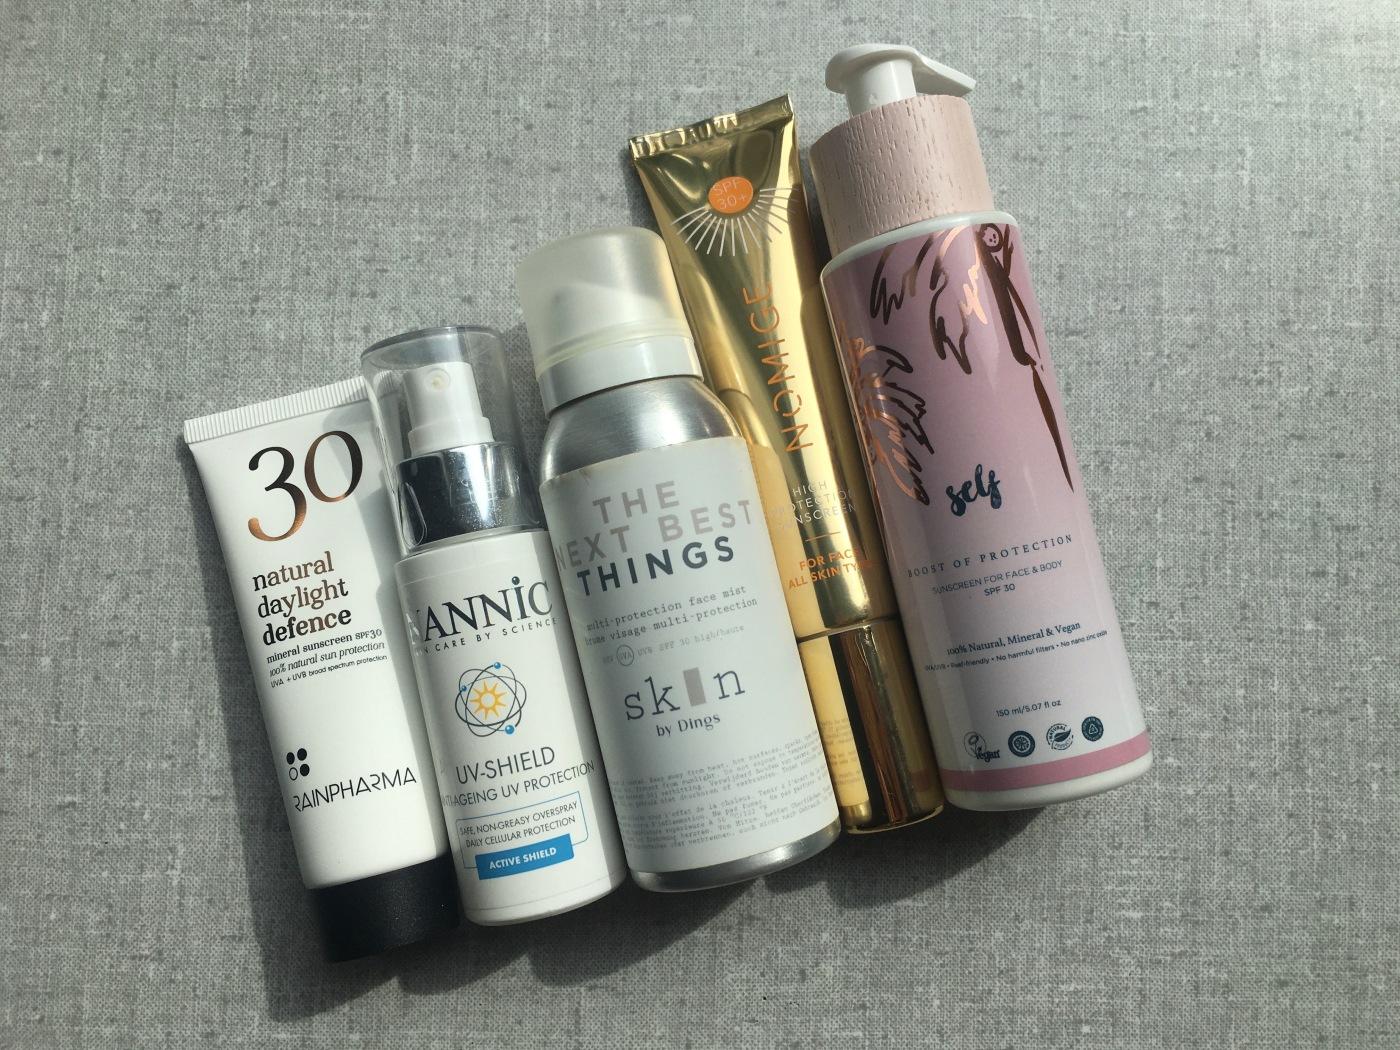 mineral SPF Belgian SPF Nannic Rainpharma Skin by Dings The Next Best Things Nomige Self